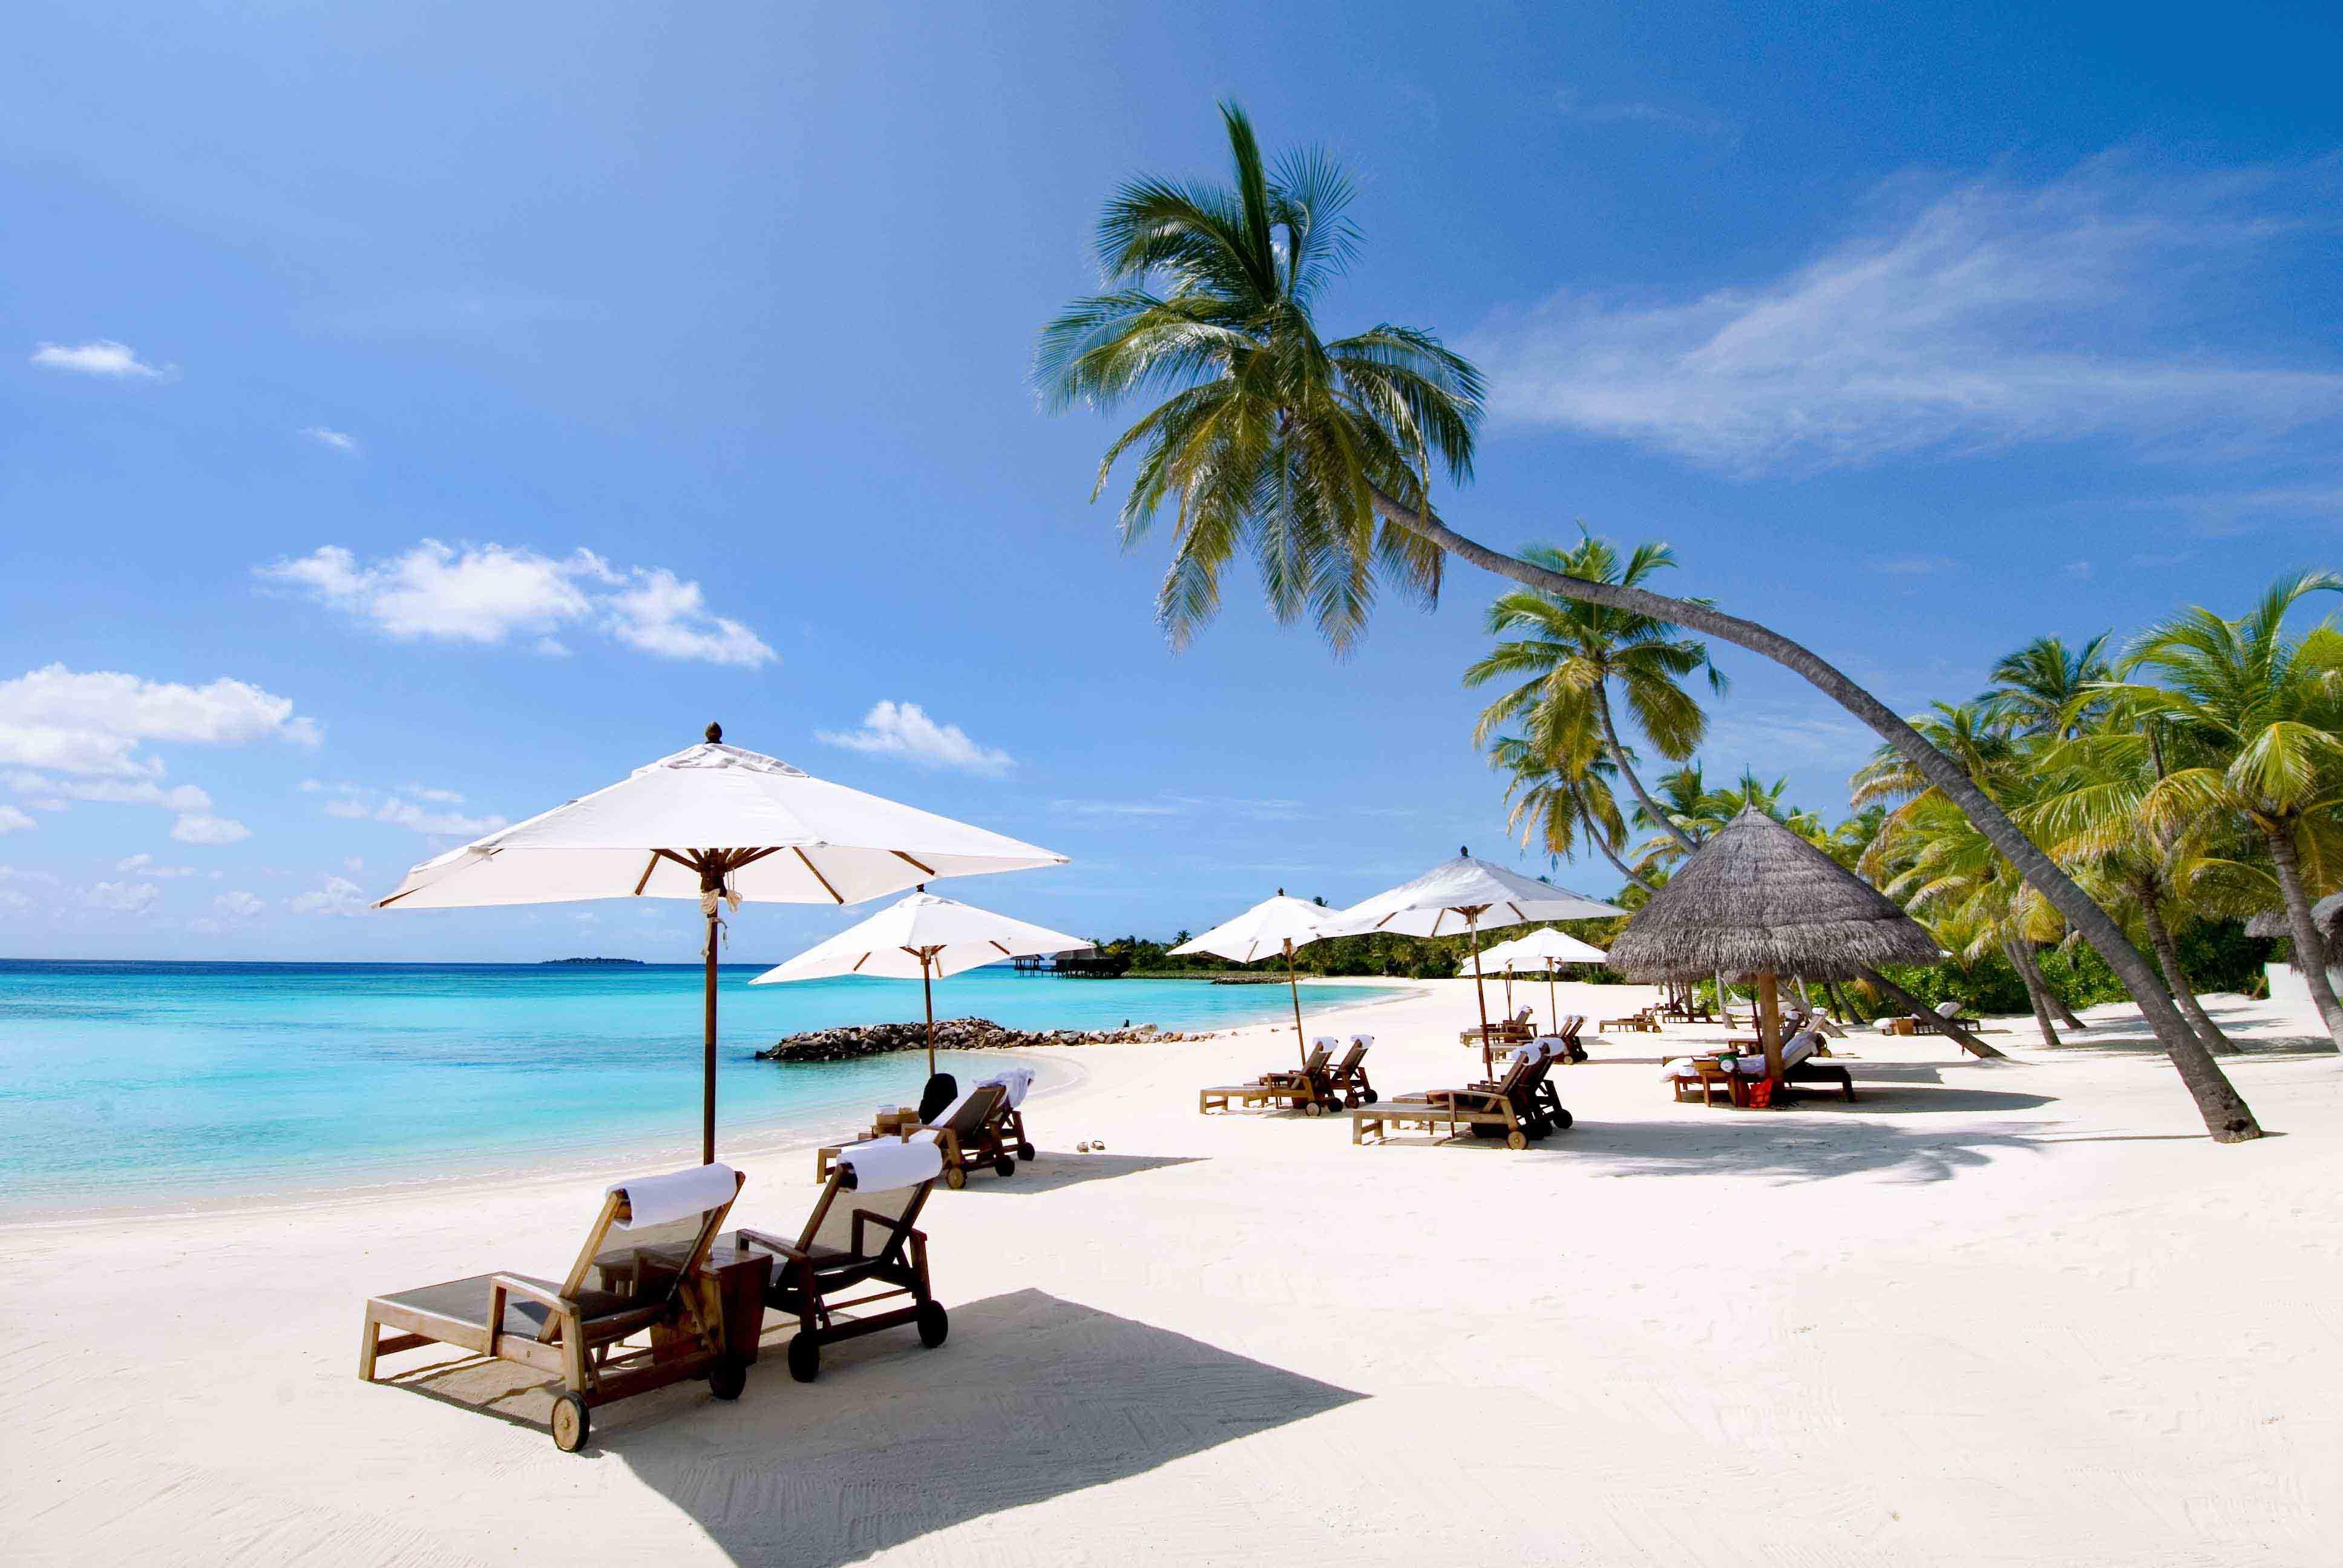 Nha Trang travel guide 03